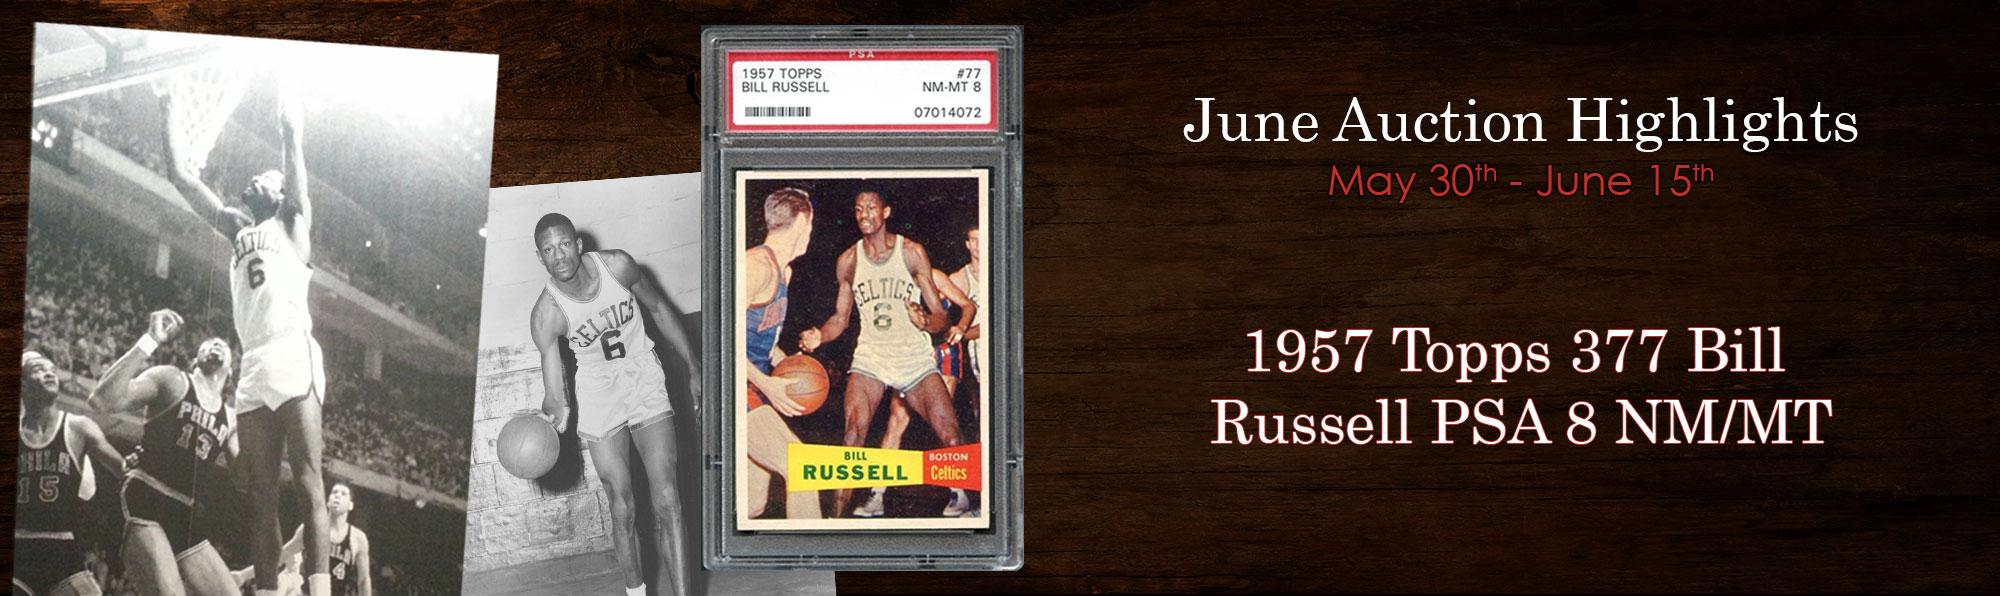 1957 Topps 377 Bill Russell PSA 8 NM/MT